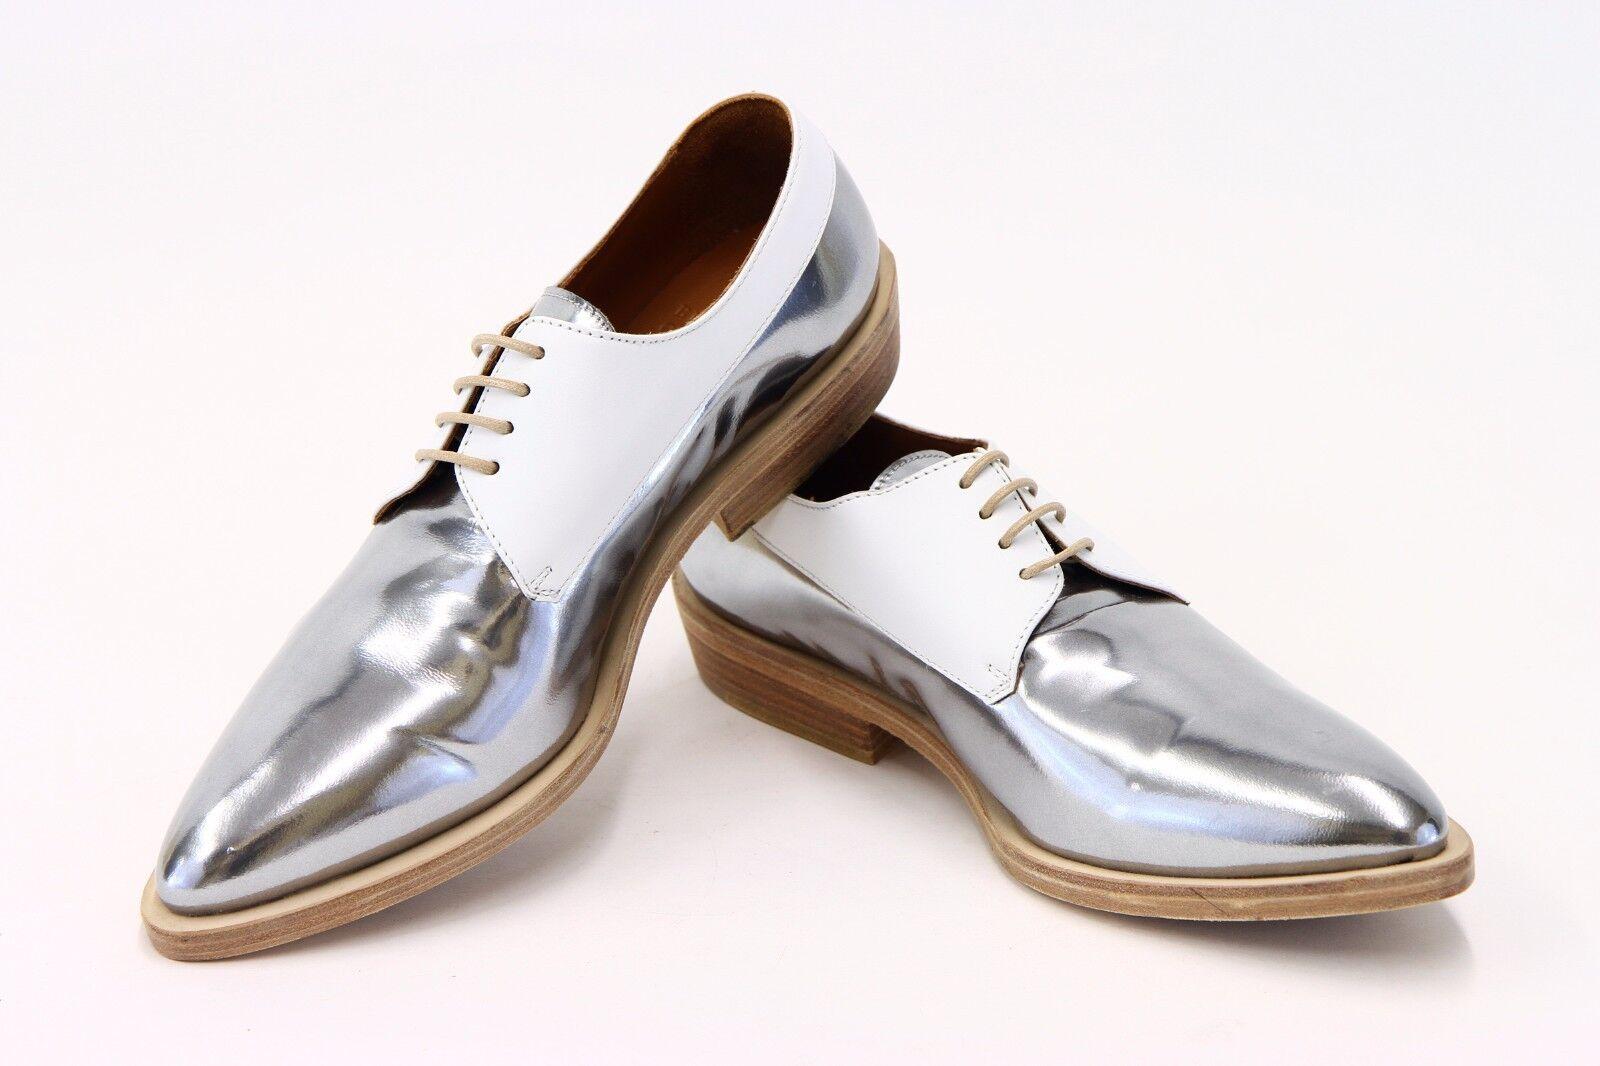 NWOB  1425 Brunello Cucinelli 2-Tone Metallic Leather Lace-Up Derbys 37 7US A176